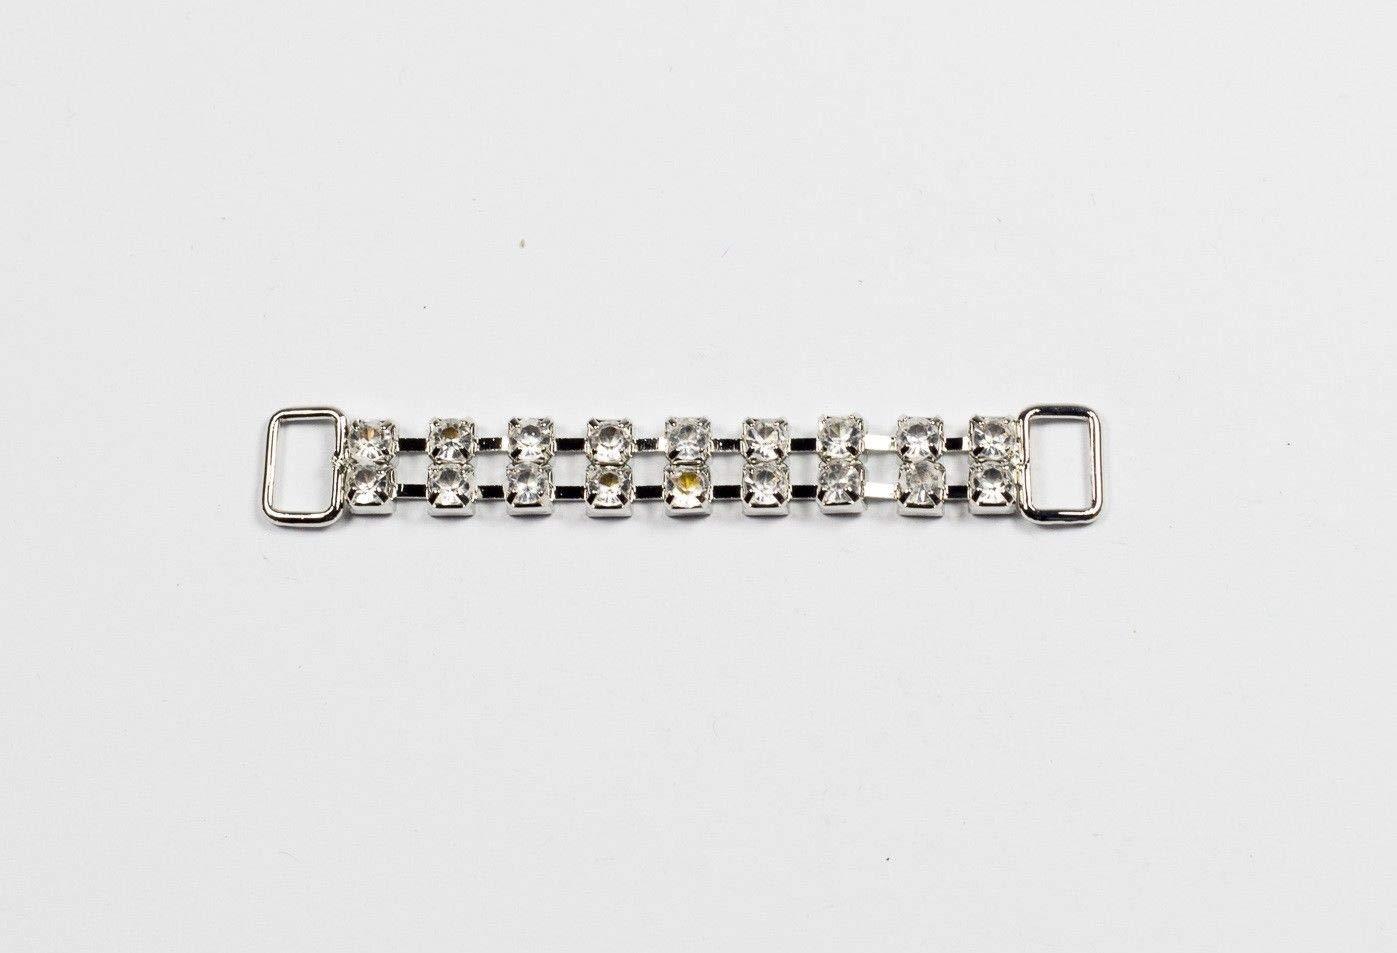 5 Pieces /× 2-Row Rhinestone Bikini Connectors Buckles Metal Chain 55mm Long